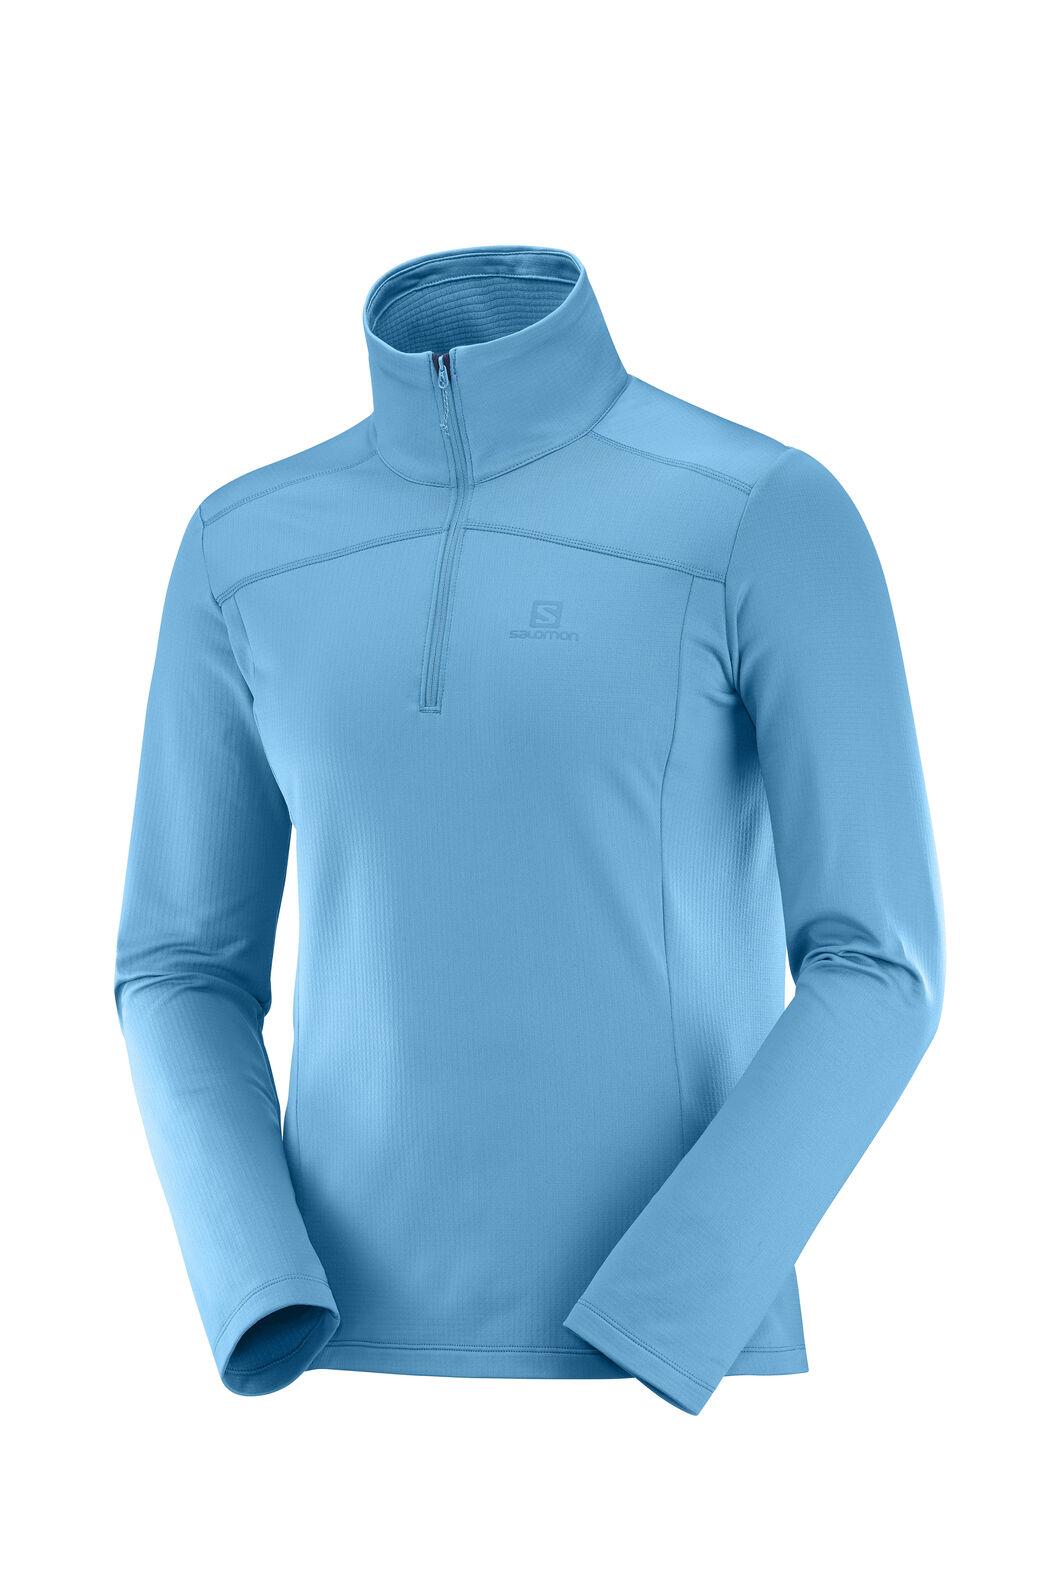 Salomon Discovery LT HZ Fleece Pullover — Men's, Fjord Blue, hi-res